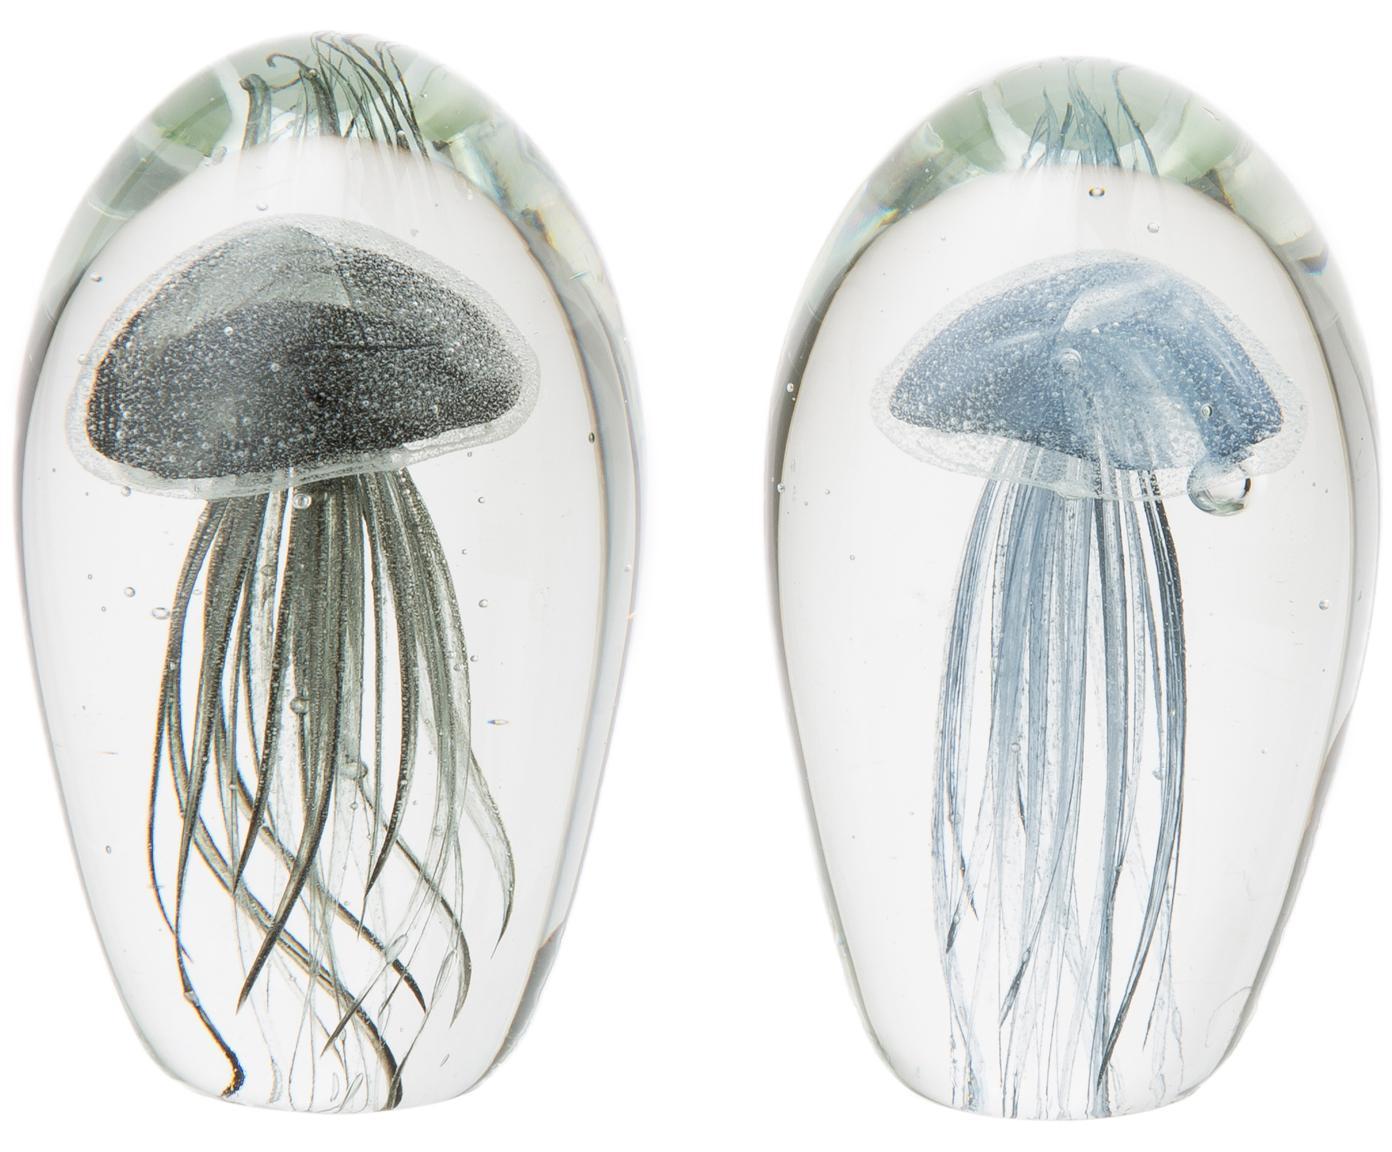 Decoratieve objectenset Medusa, 2-delig, Geverfd glas, Presse-papier: transparant. Kwallen: grijsblauw, zwart, Ø 8 x H 12 cm